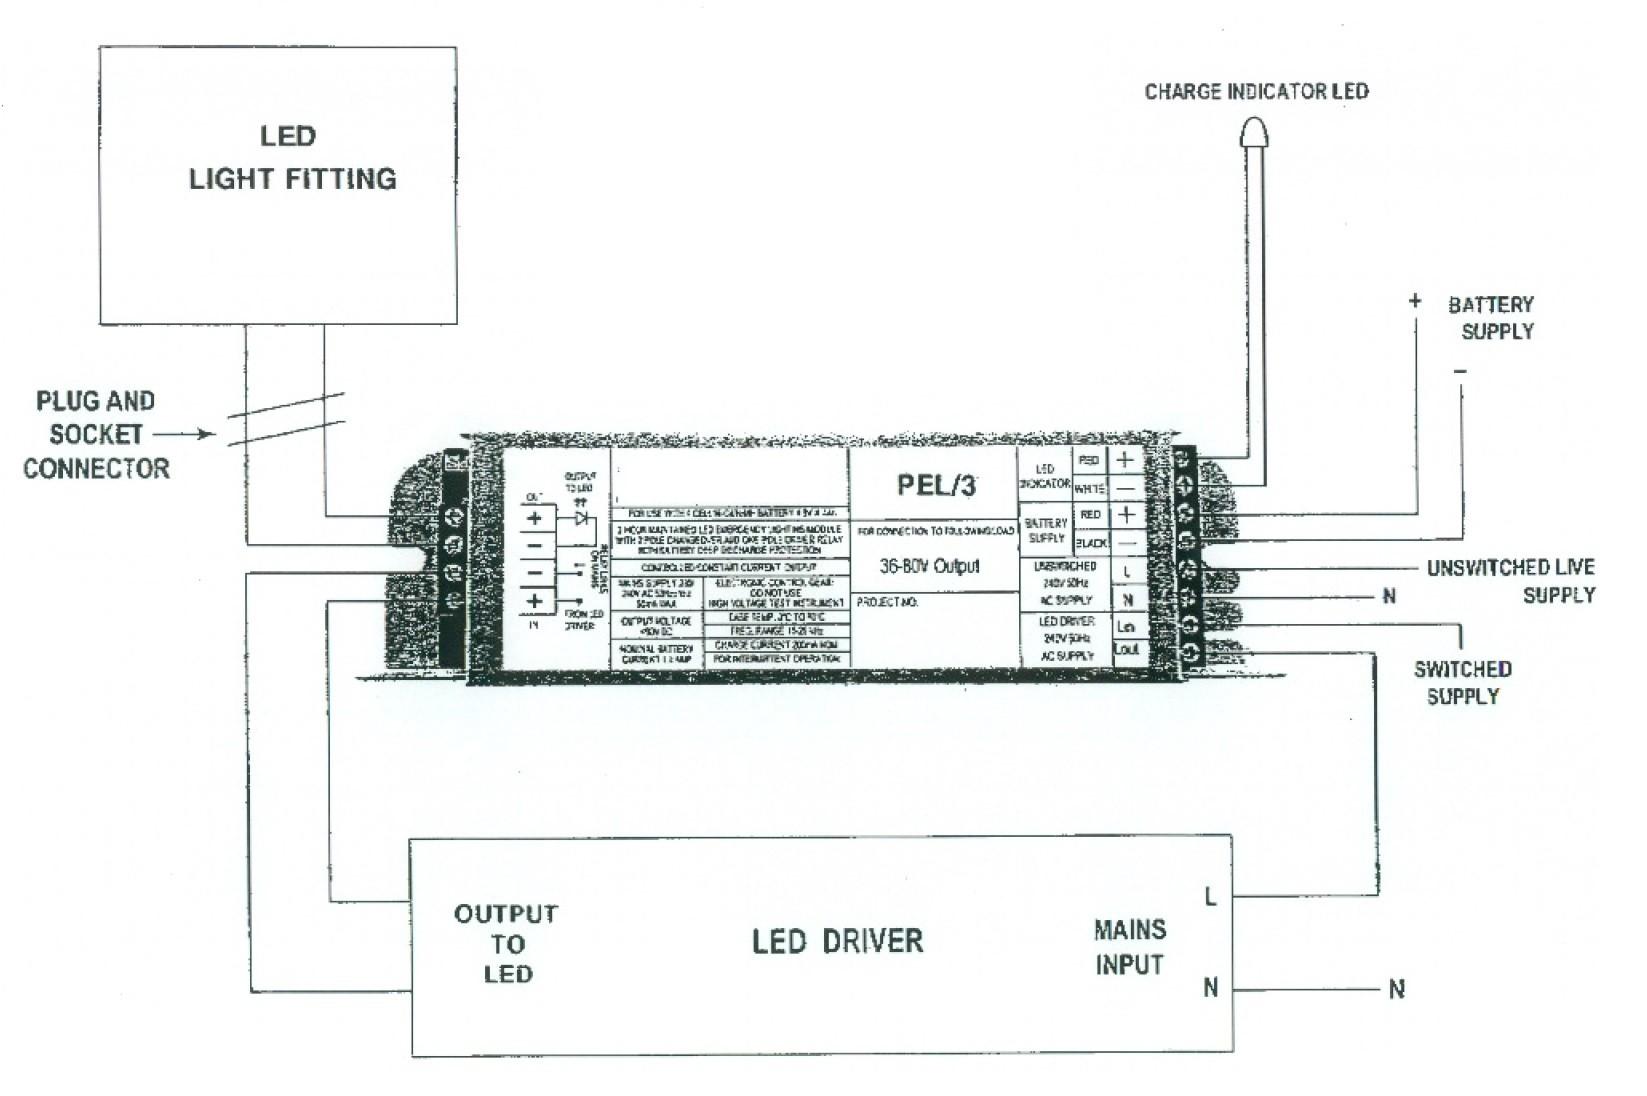 Downlight Transformer Wiring Diagram - House Wiring Diagram Symbols •